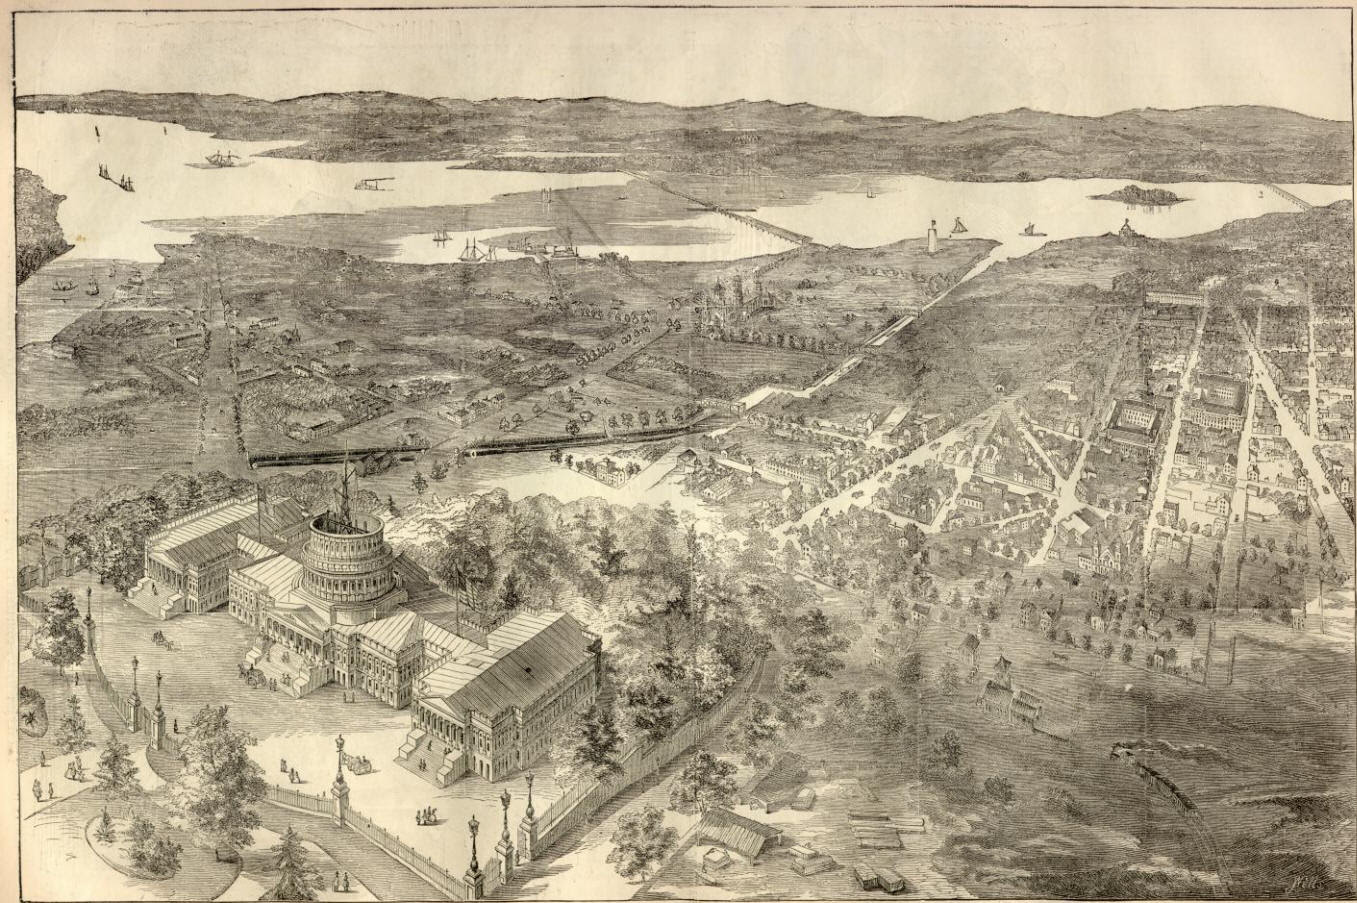 http://www.sonofthesouth.net/leefoundation/civil-war/1861/july/washington-dc.jpg